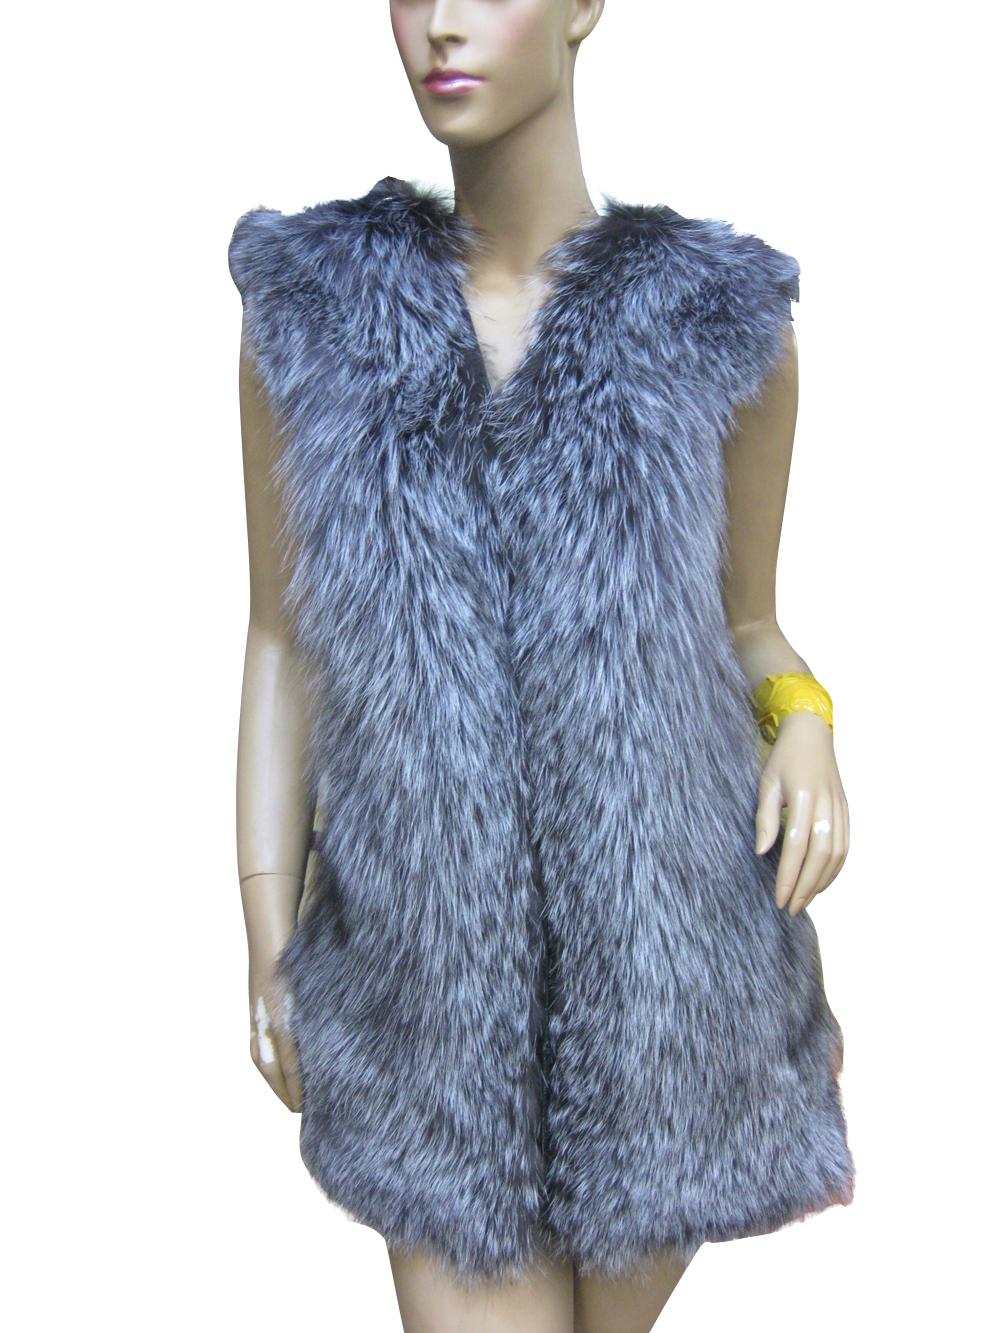 New Fashion Winter Natural Fur Vest Waistcoat Real Silver Fox Fur Add Sheepskin Leather Women Fur Vests Coat Jackets BF-V0078(China (Mainland))